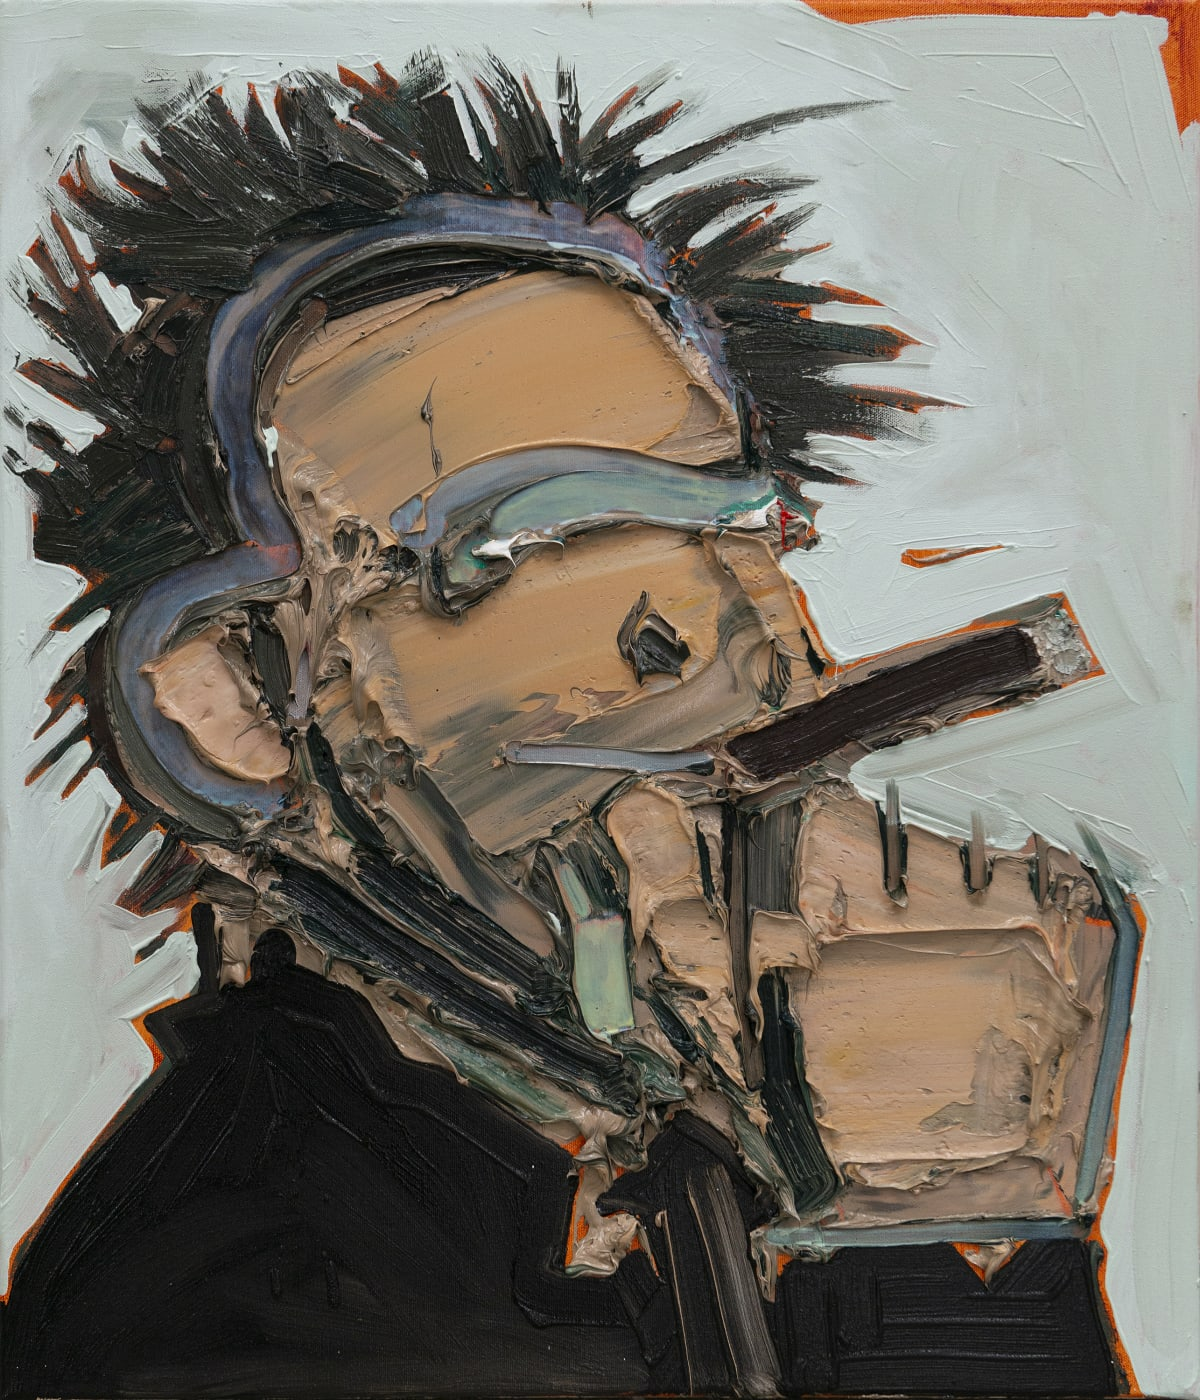 Toby Raine, Jack Nicholson Smoking A Cigar, 2018